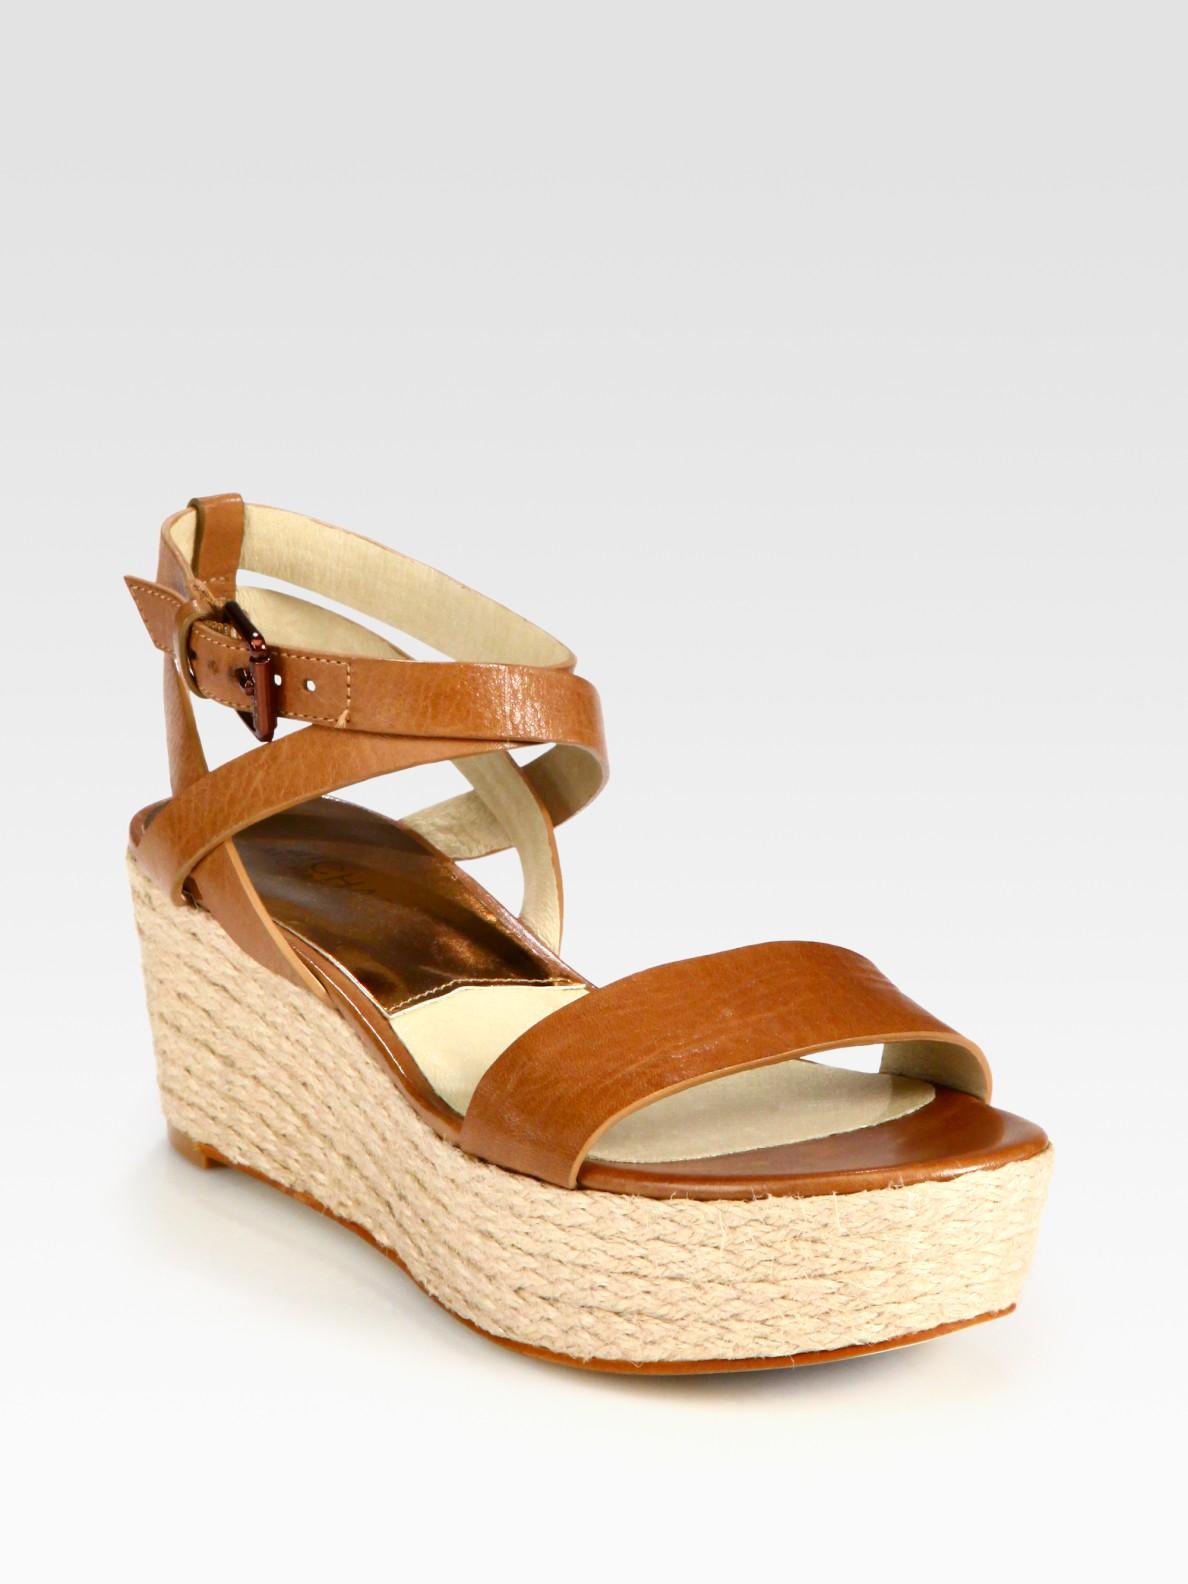 Gallery - Michael Michael Kors Jalita Leather Espadrille Wedge Sandals In